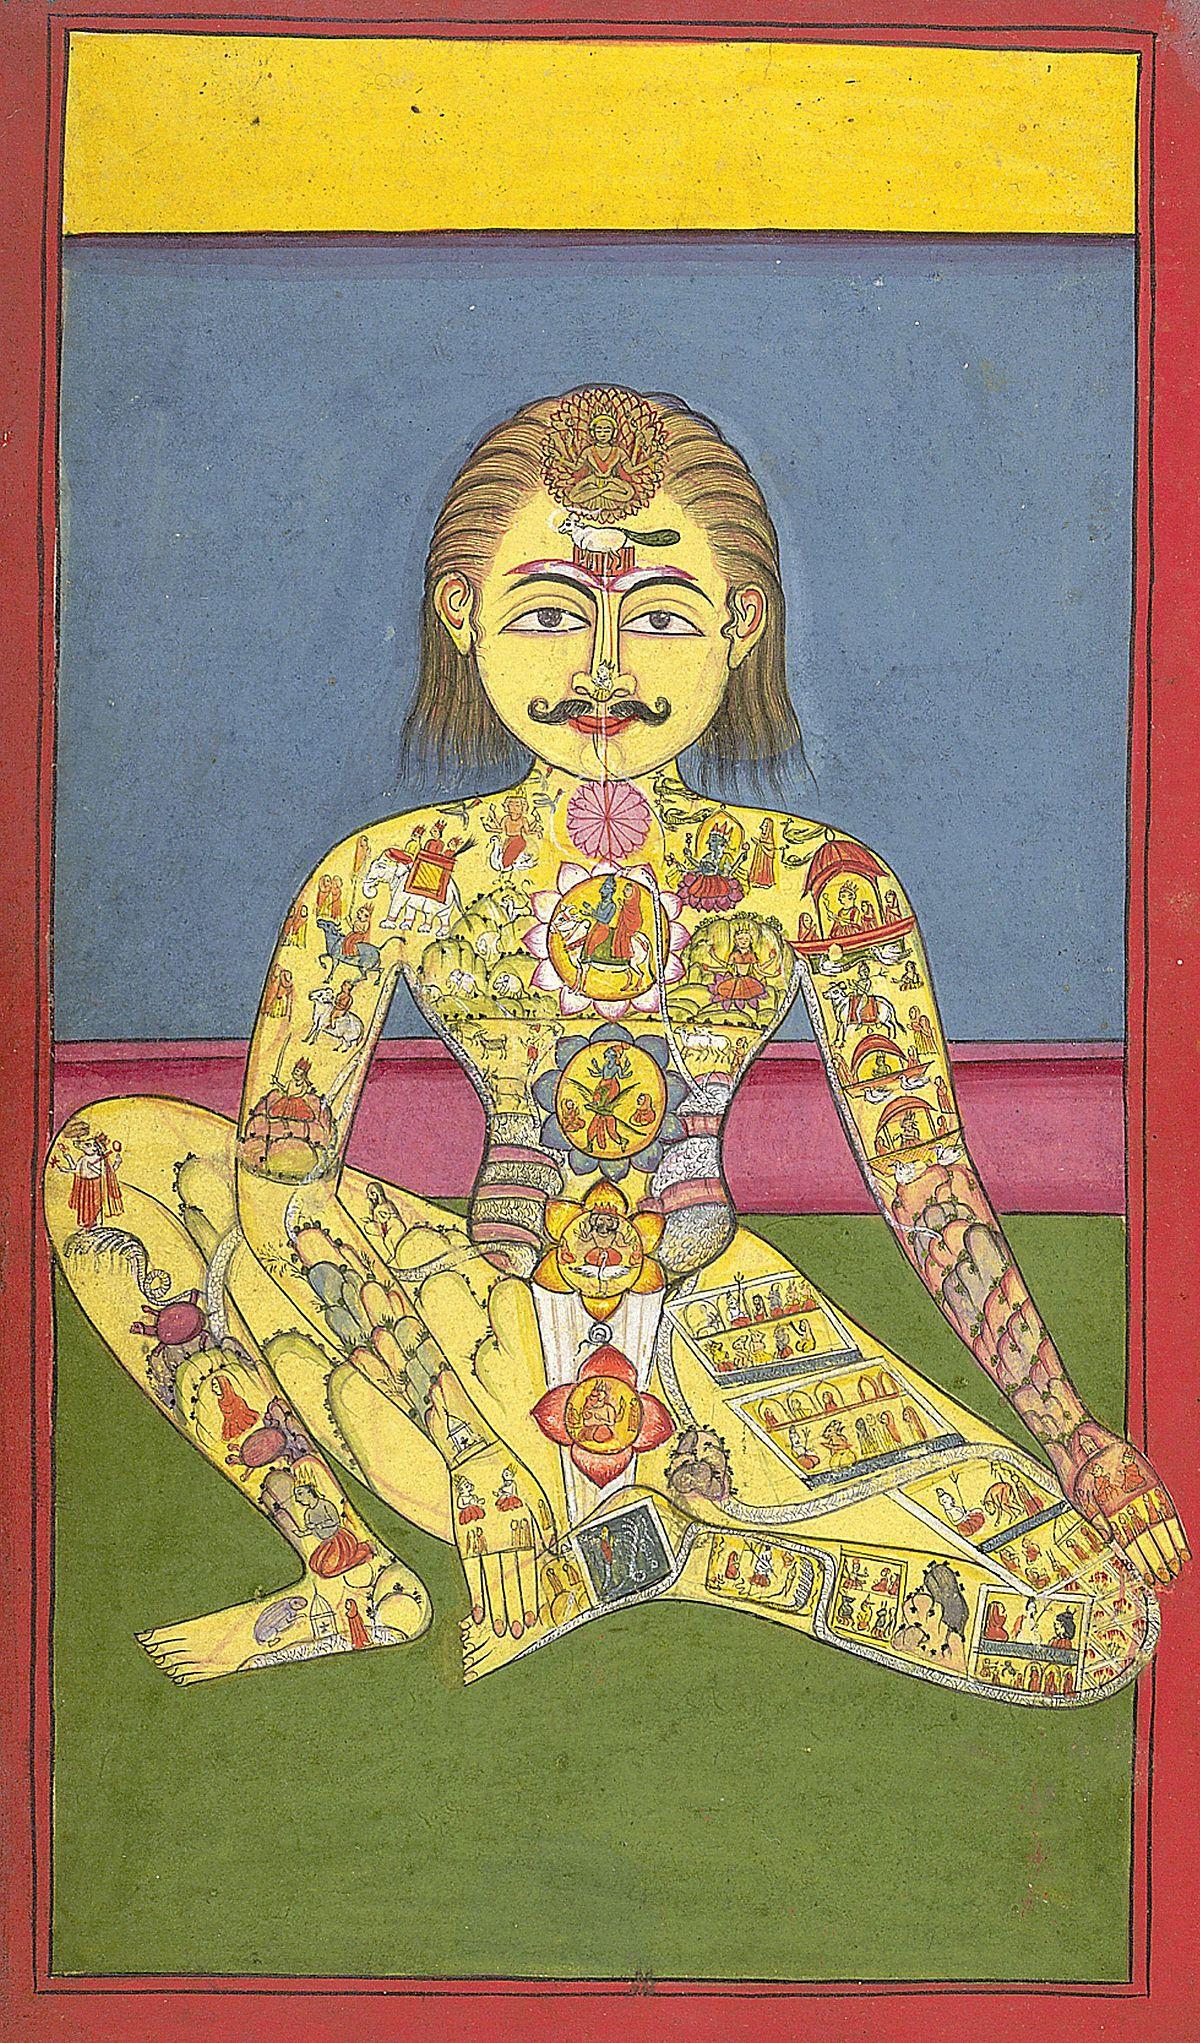 Ayurvedic Diet - Spiritually Minded Cuisine For Achieving Internal Balance